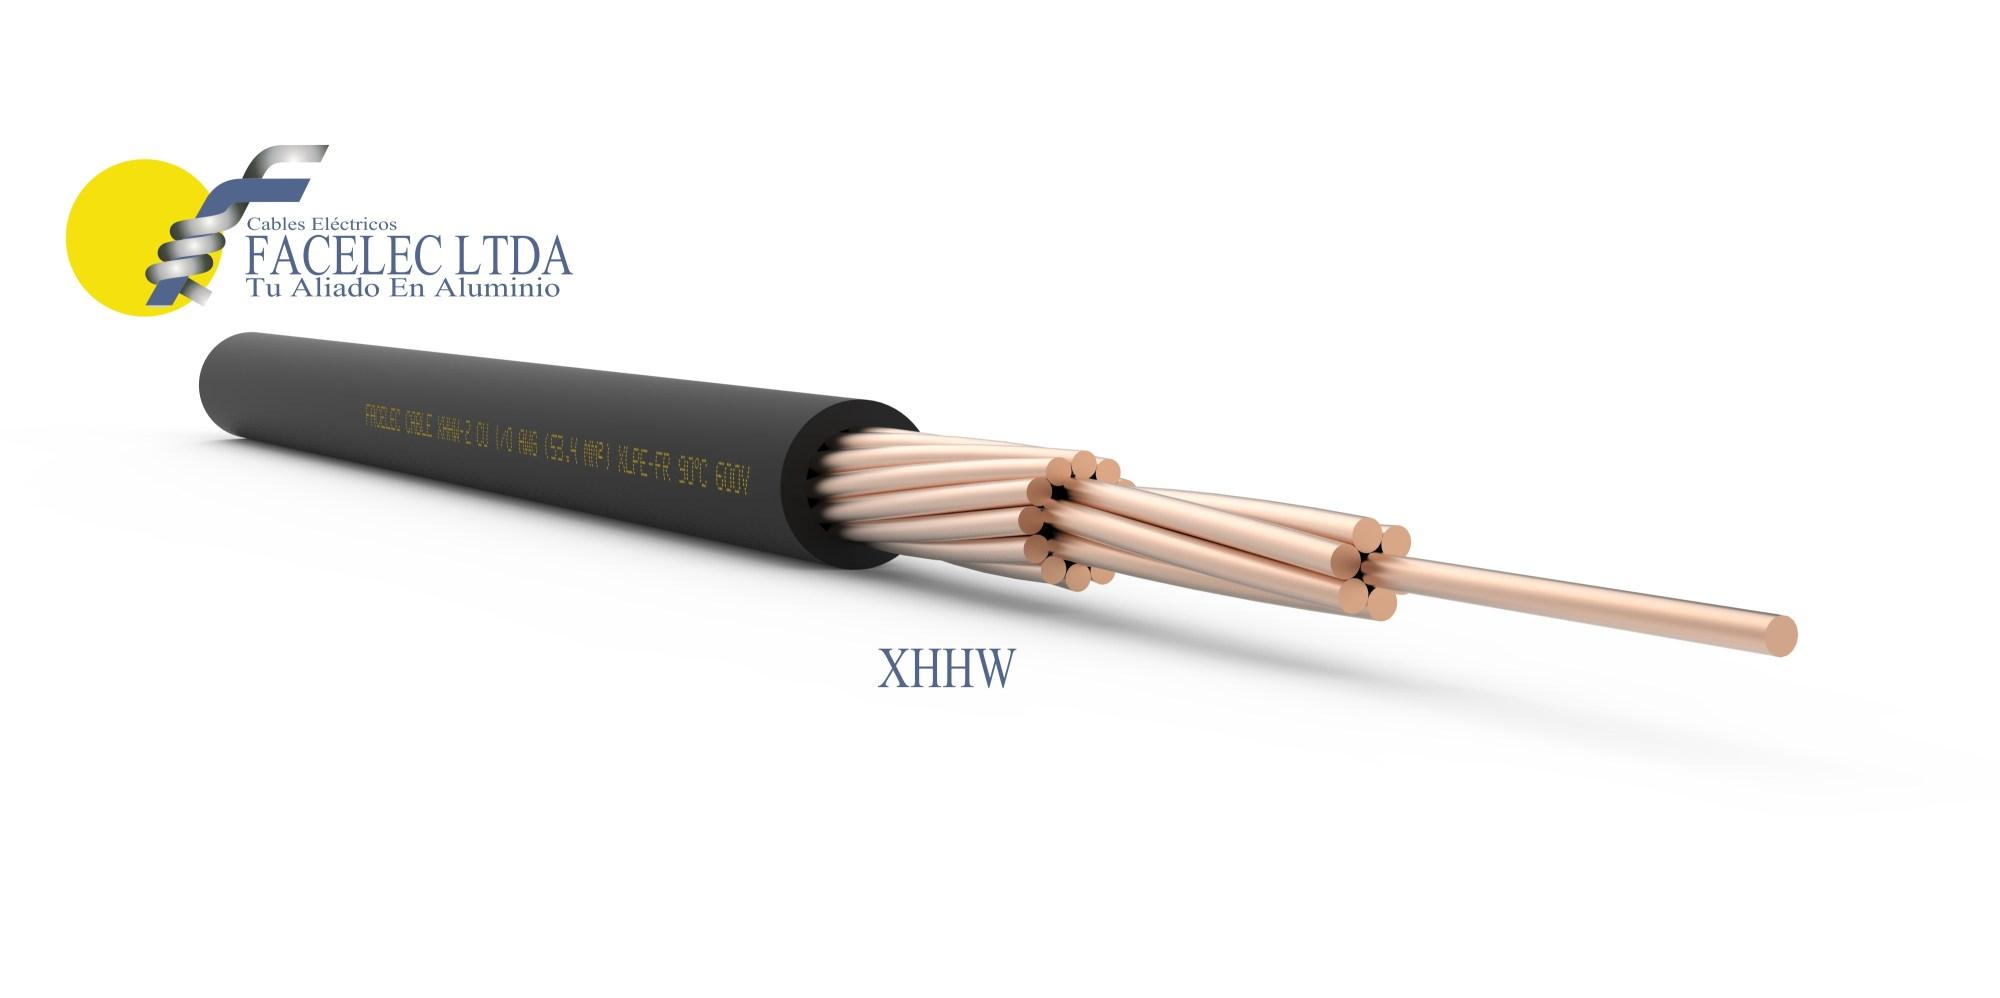 hight resolution of xhhw cobre